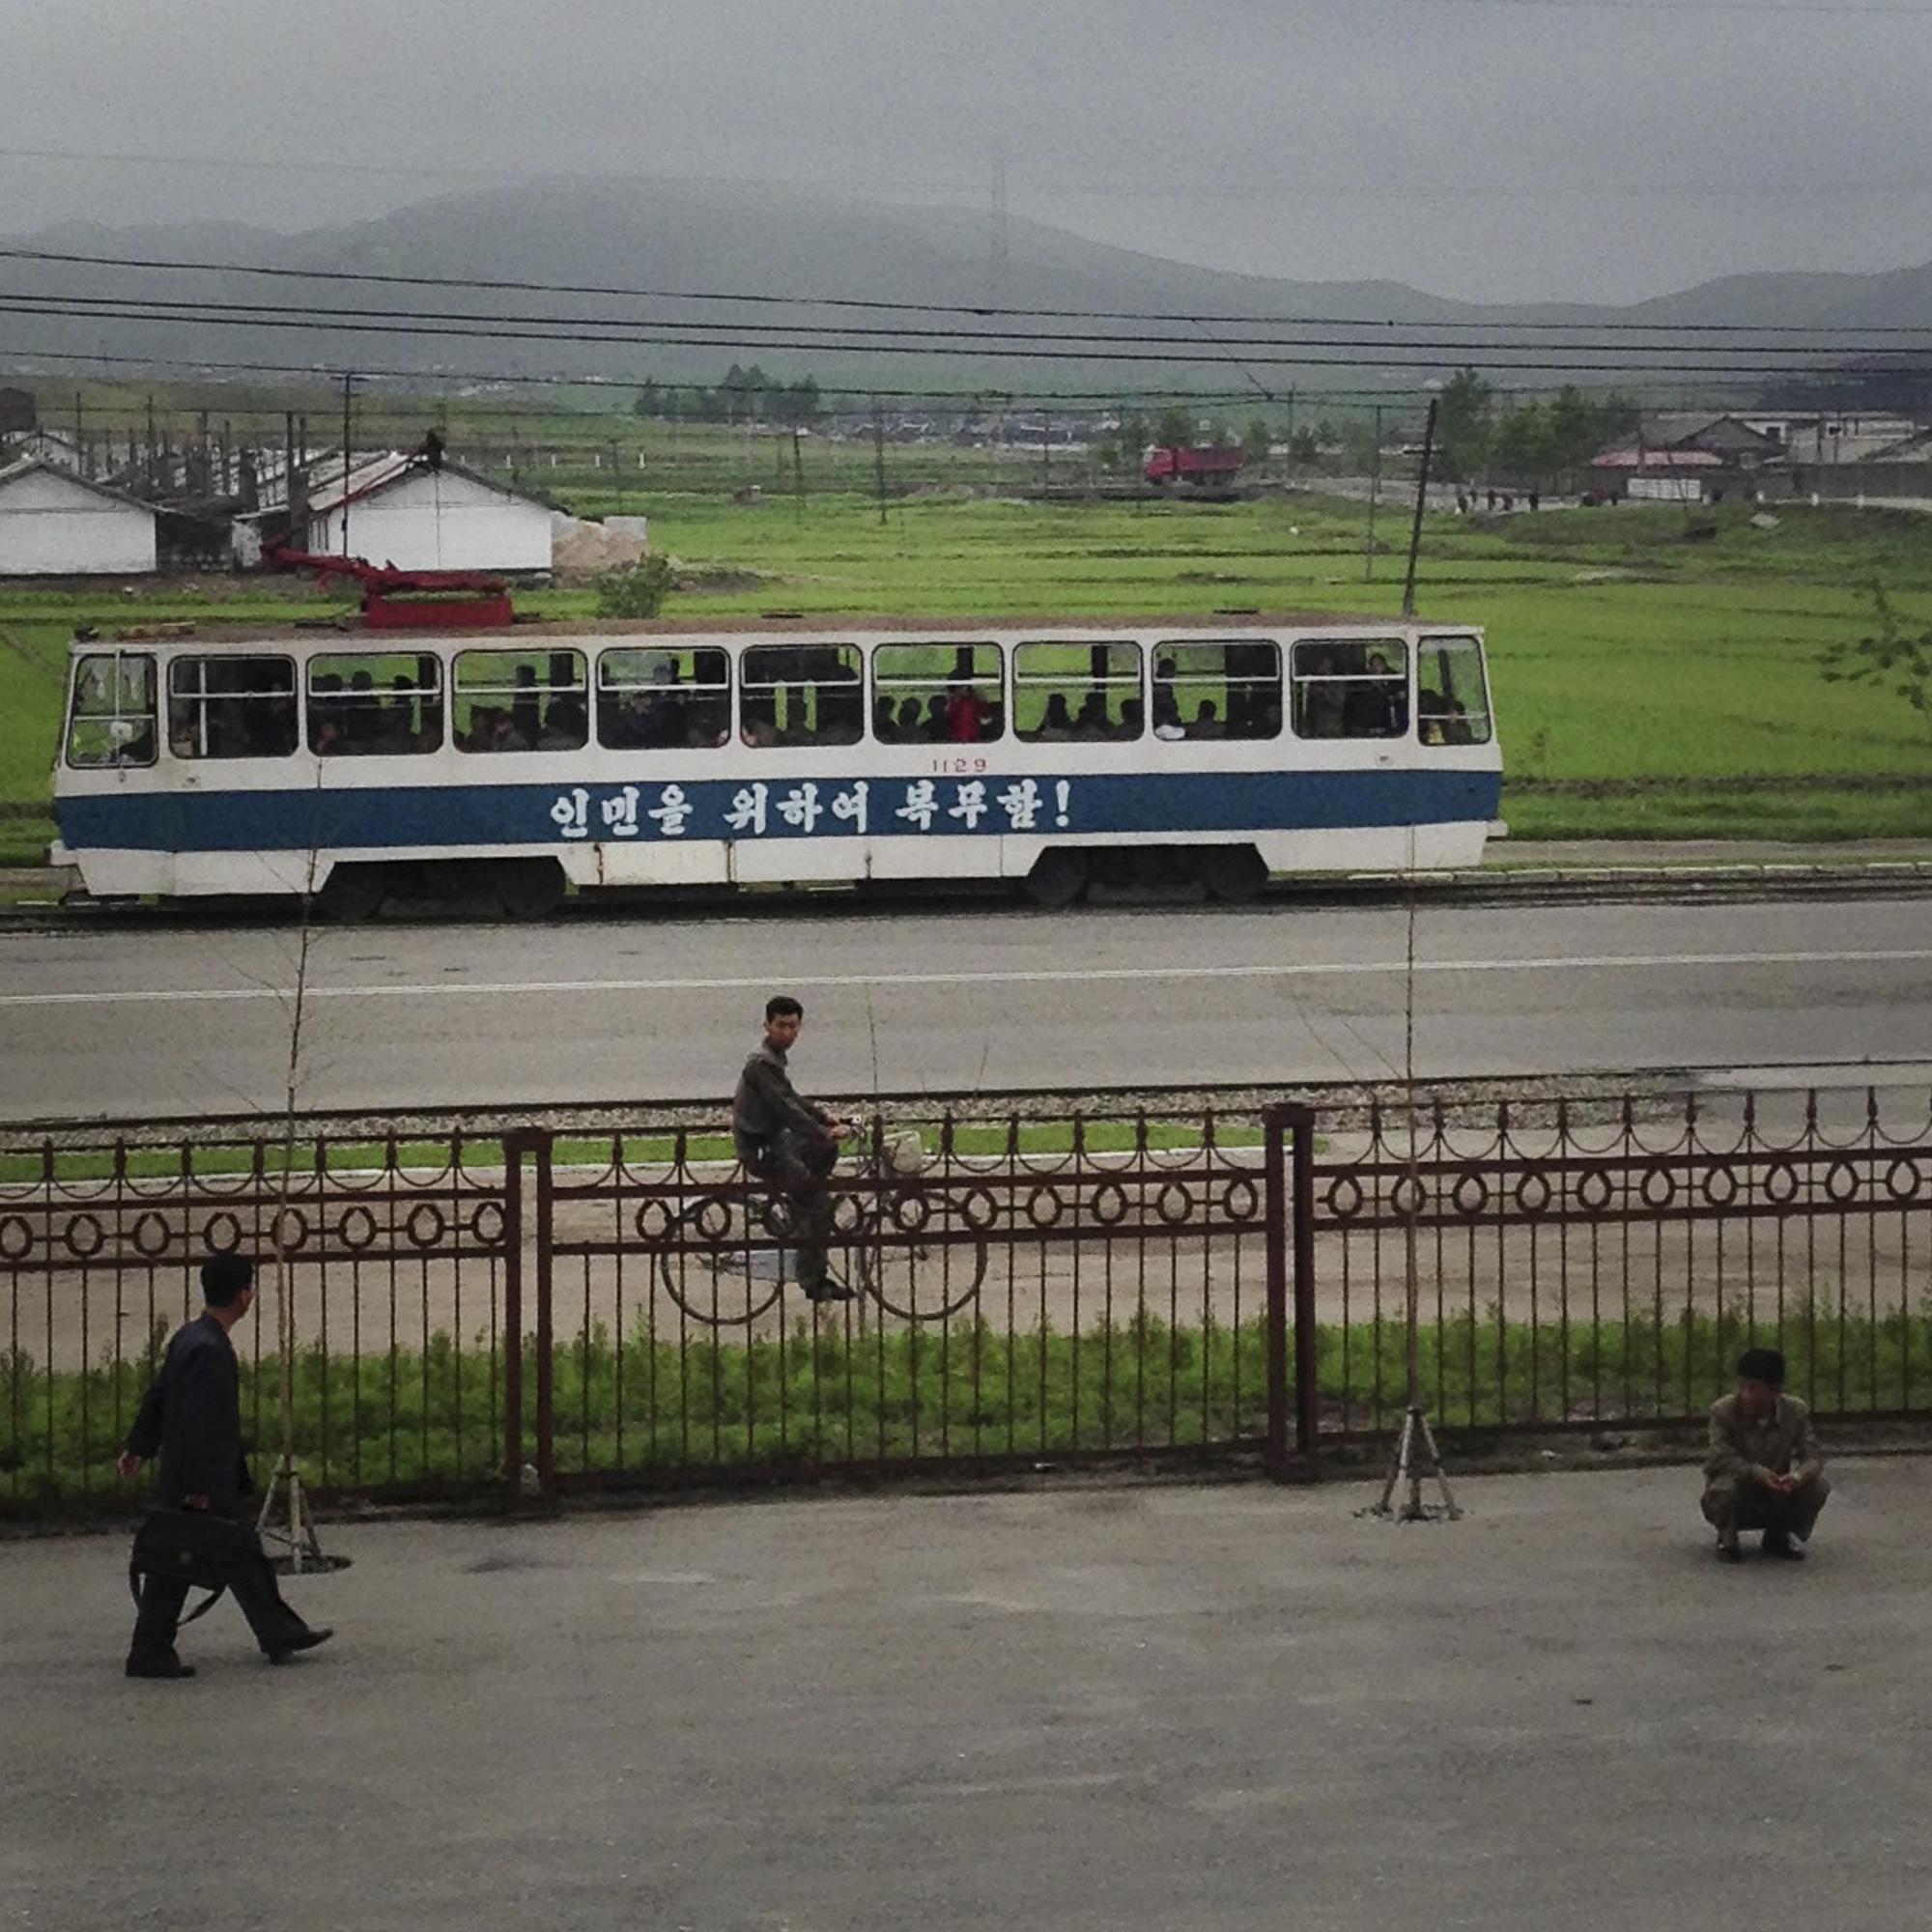 Public transportation in Chongjin North Korea.